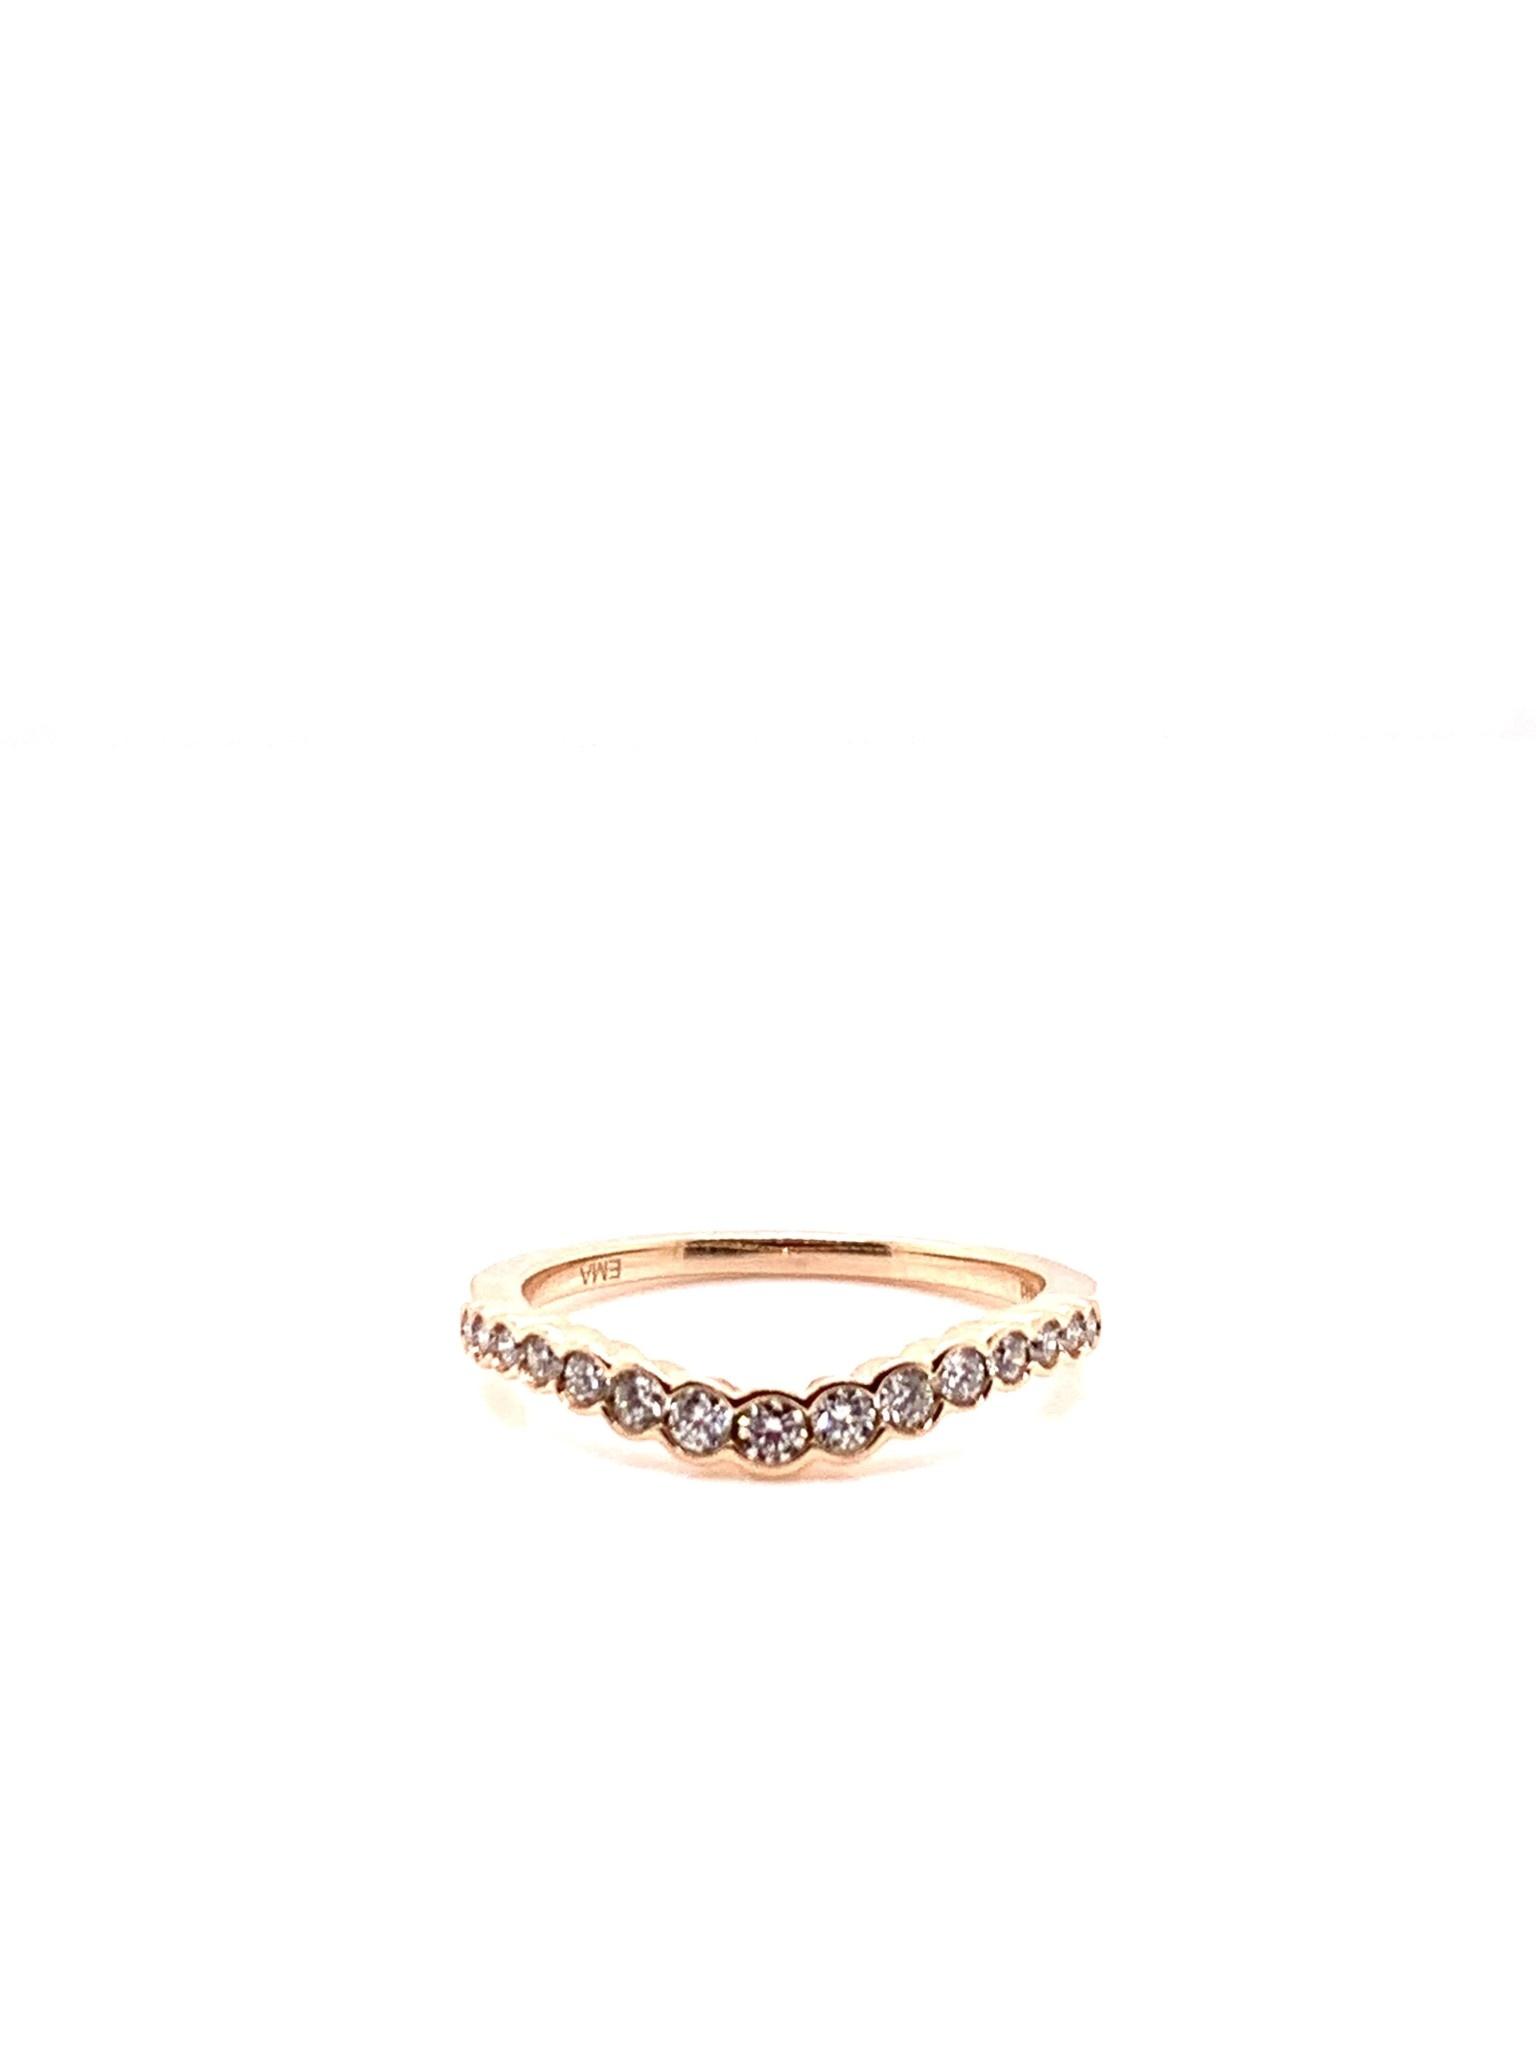 14K rose gold contour diamond band 0.25ct